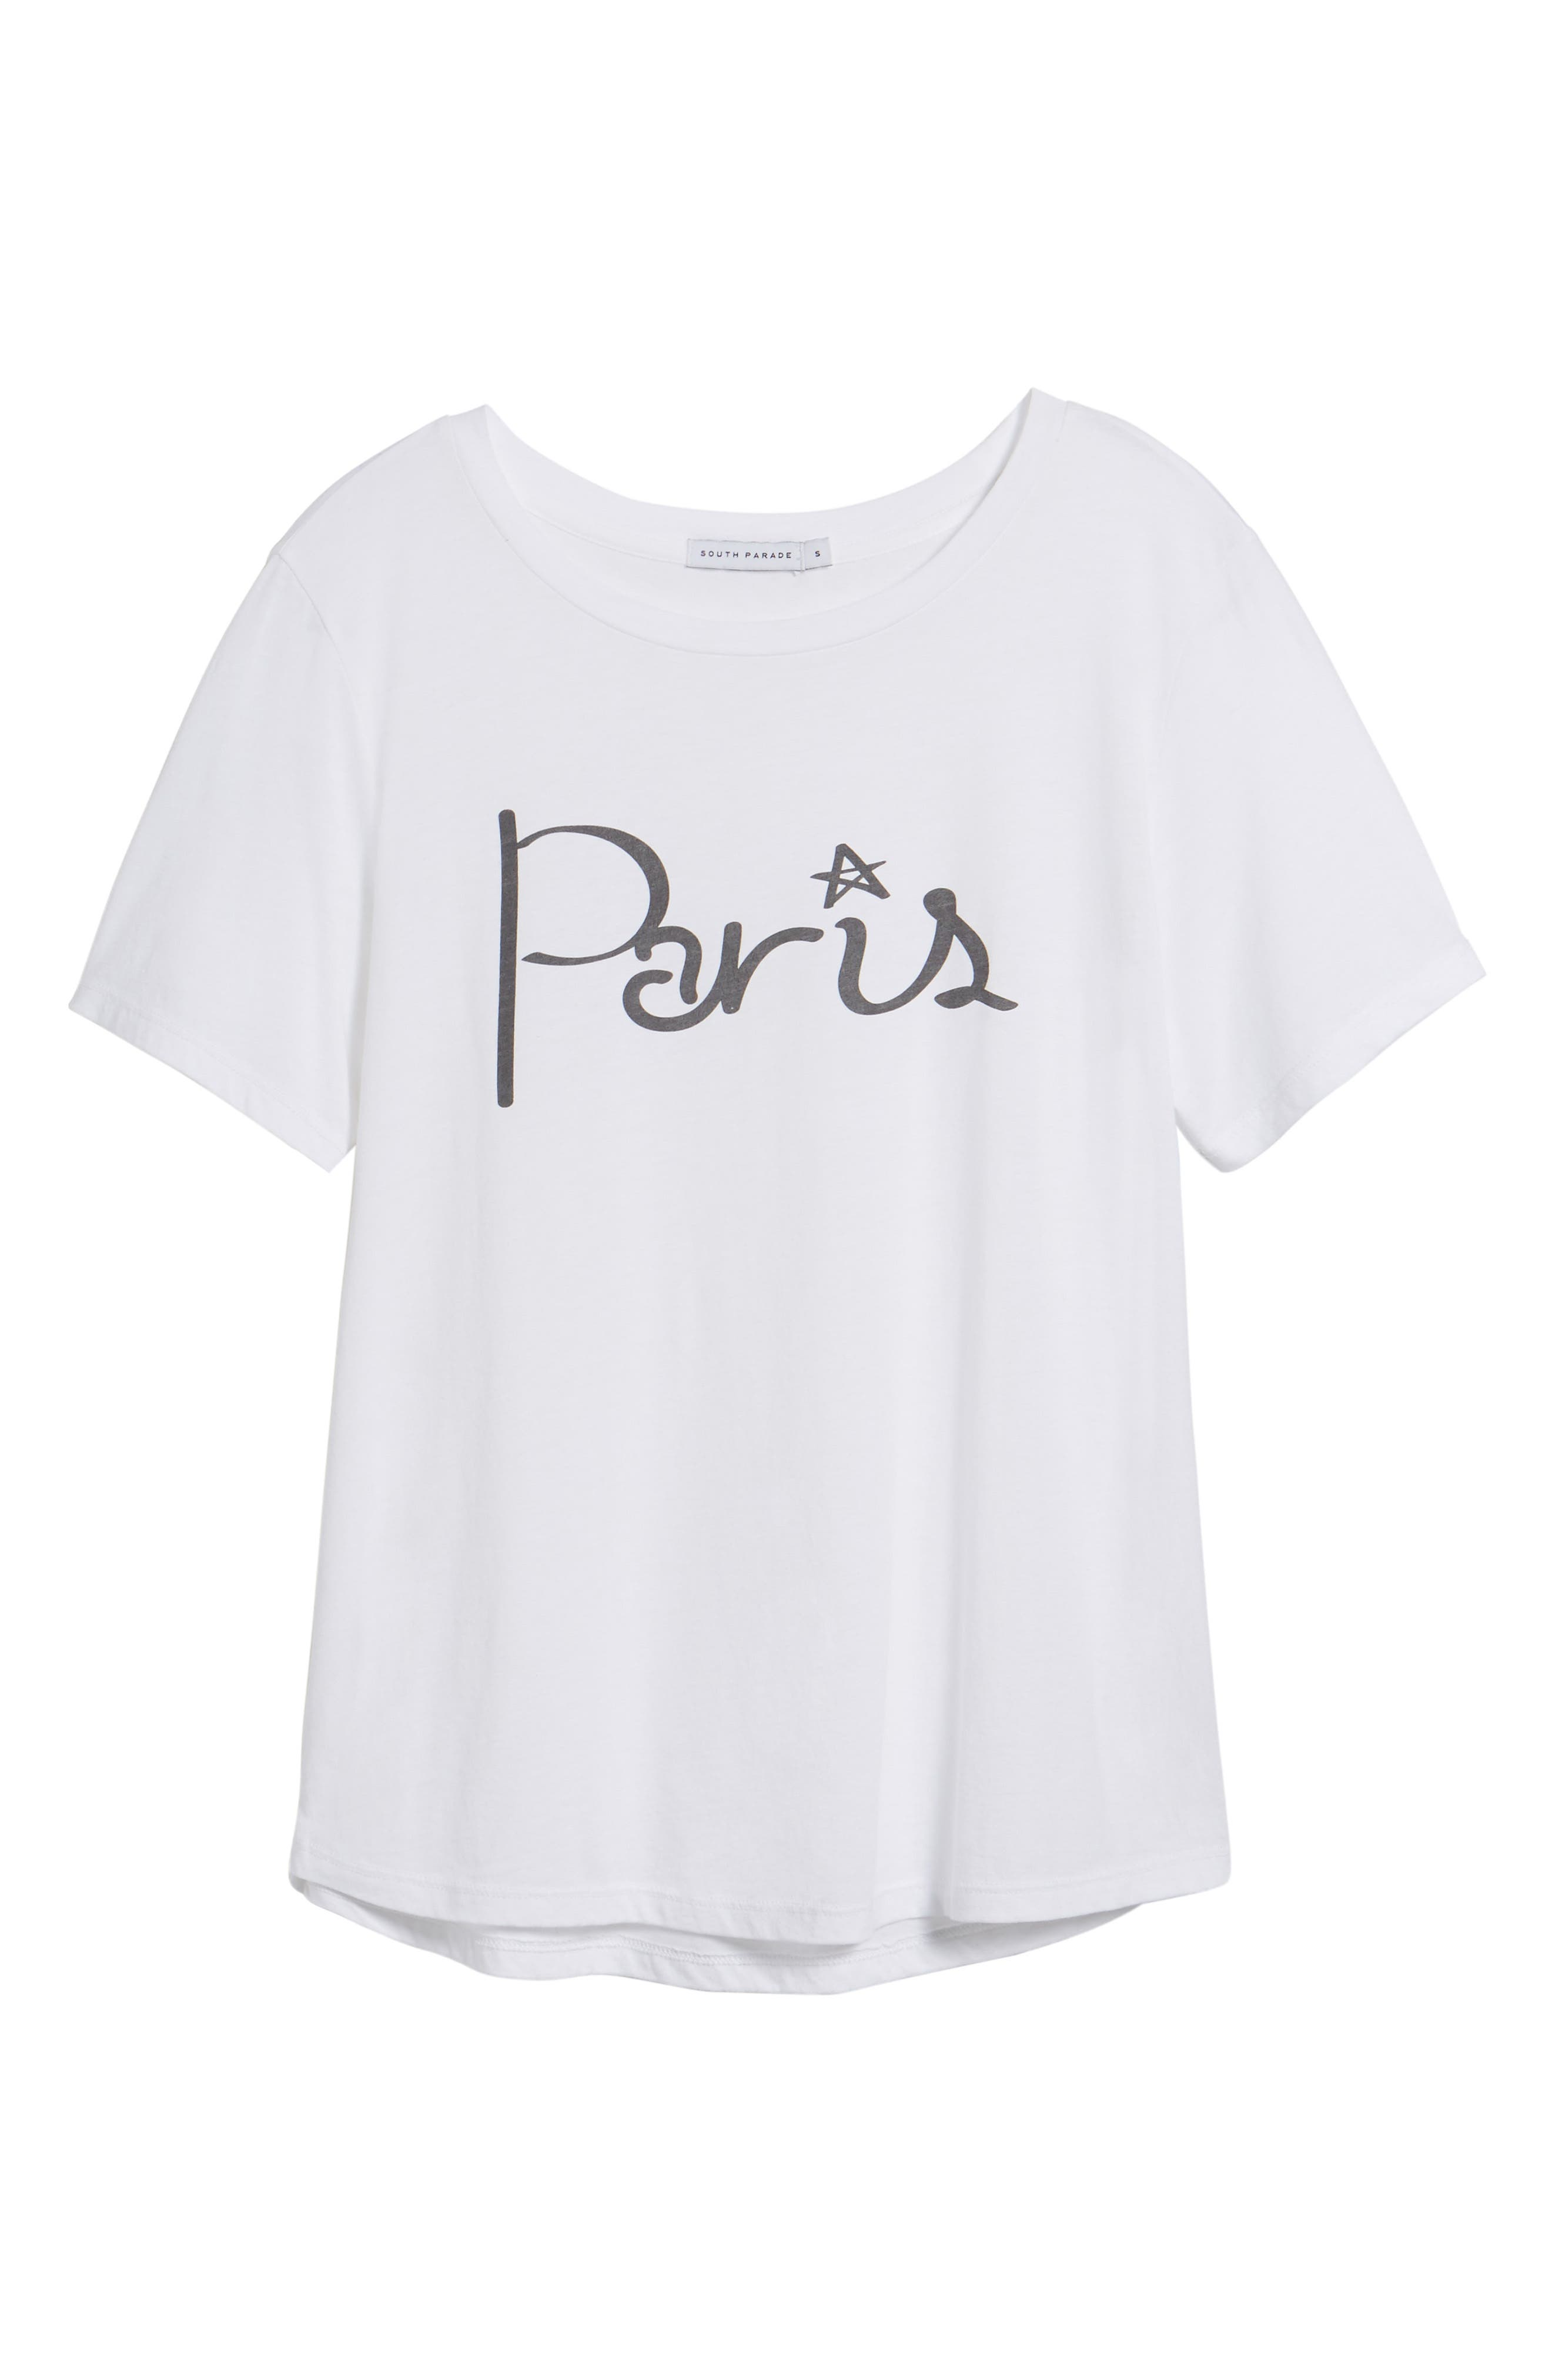 Paris Tee,                             Alternate thumbnail 6, color,                             100